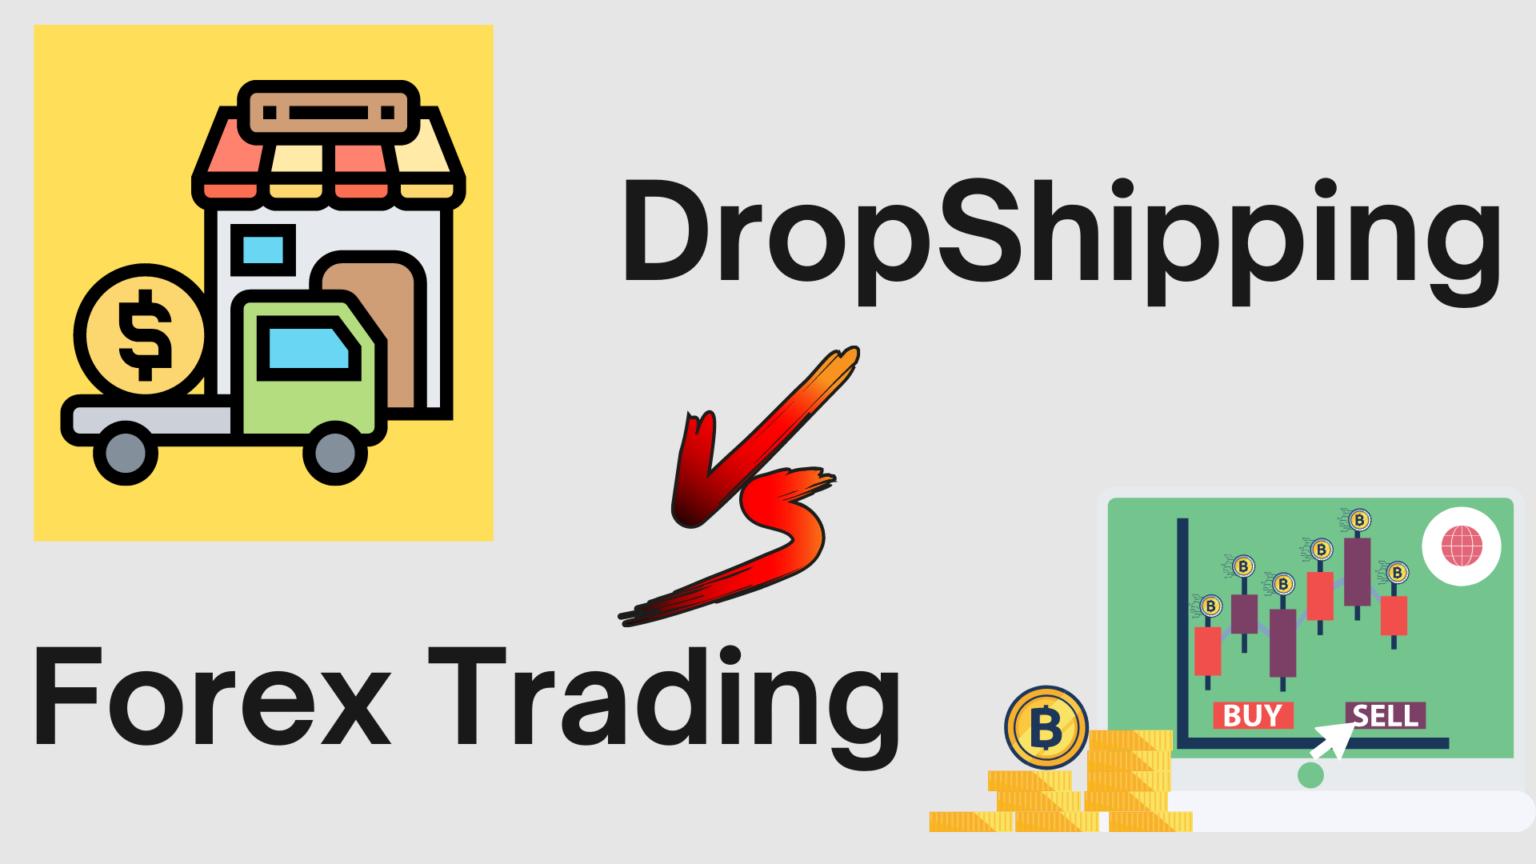 DropShipping Vs Forex